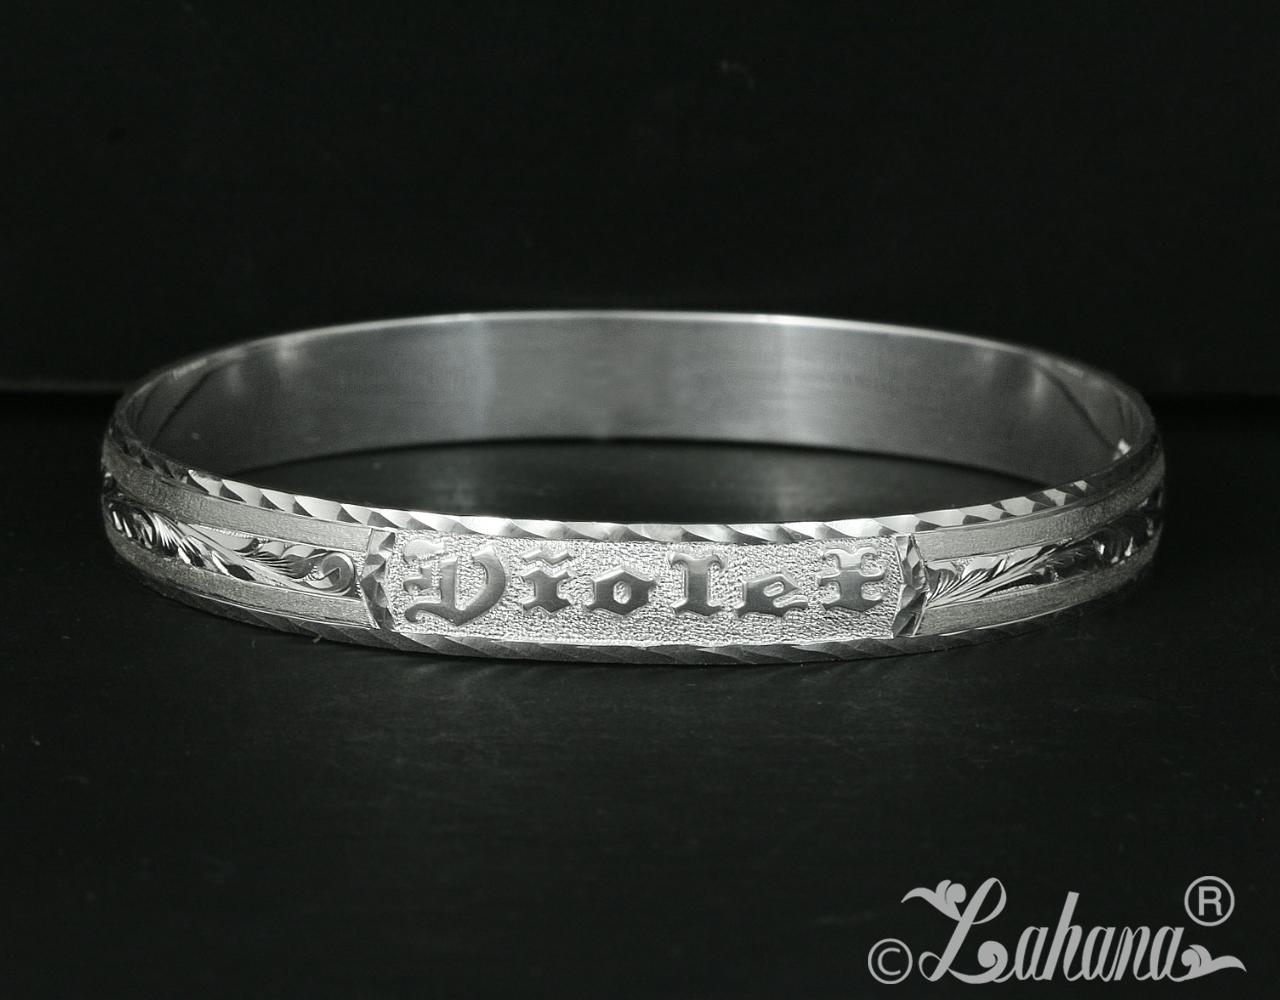 modern-design-customized-bangle-wm1.jpg